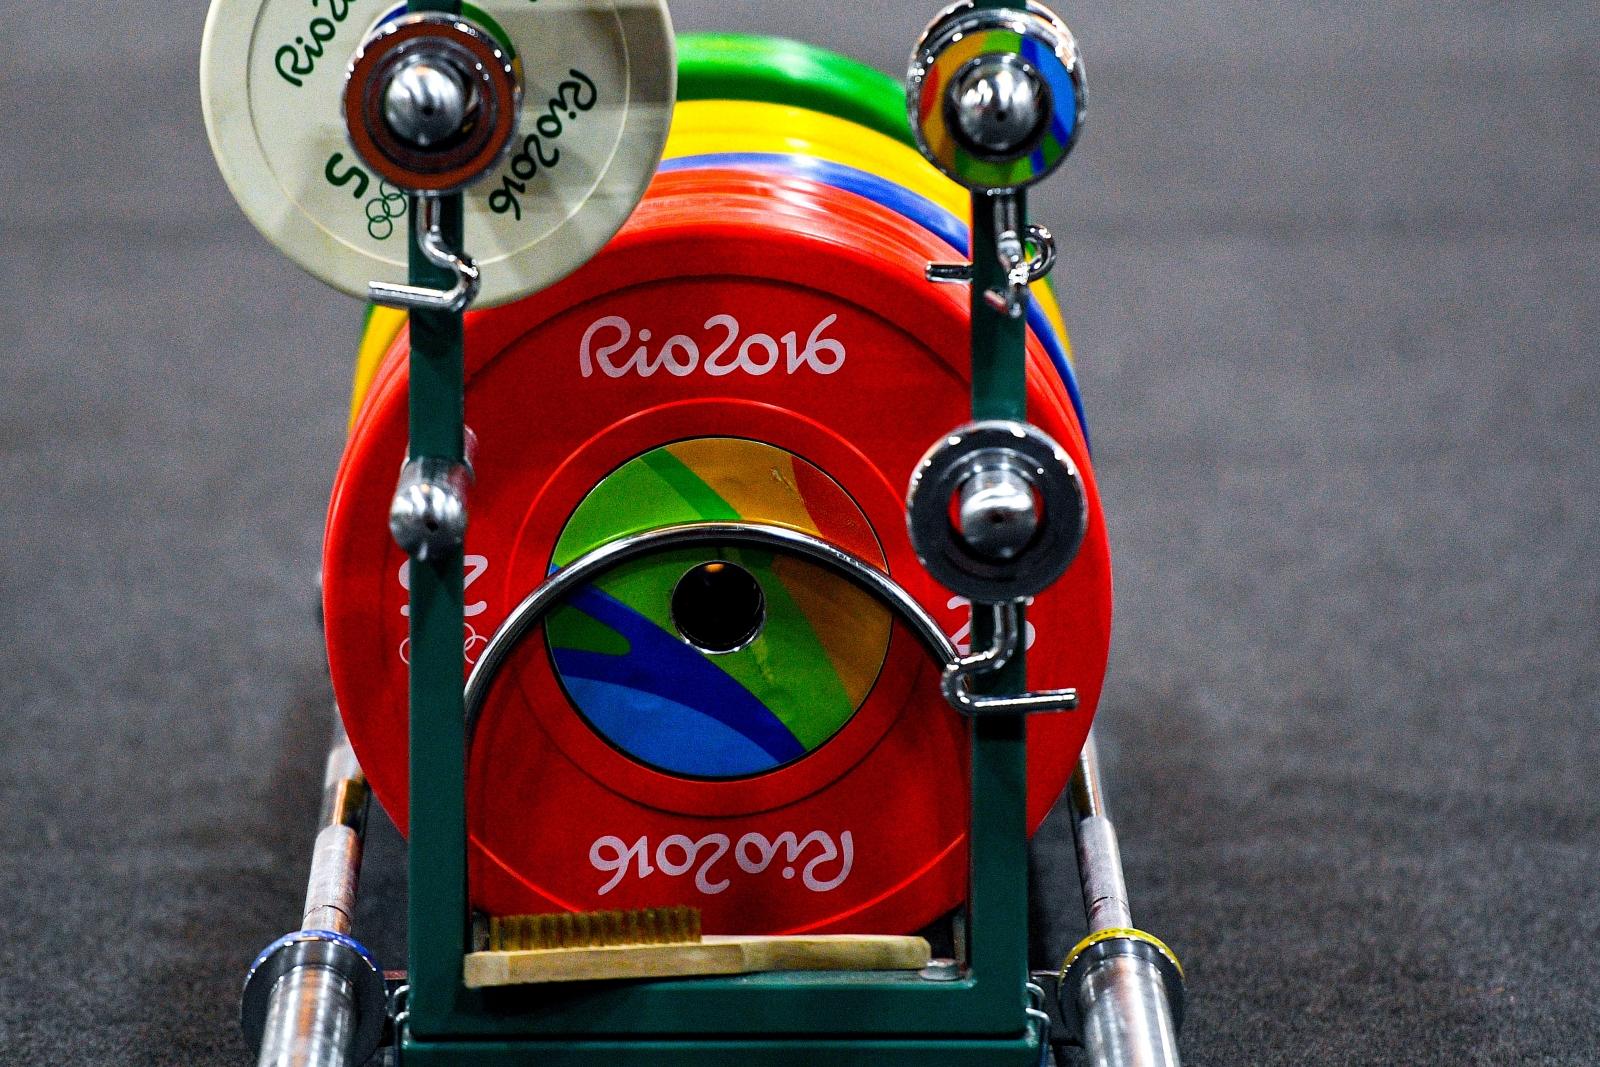 Rio 2016 weightlifting